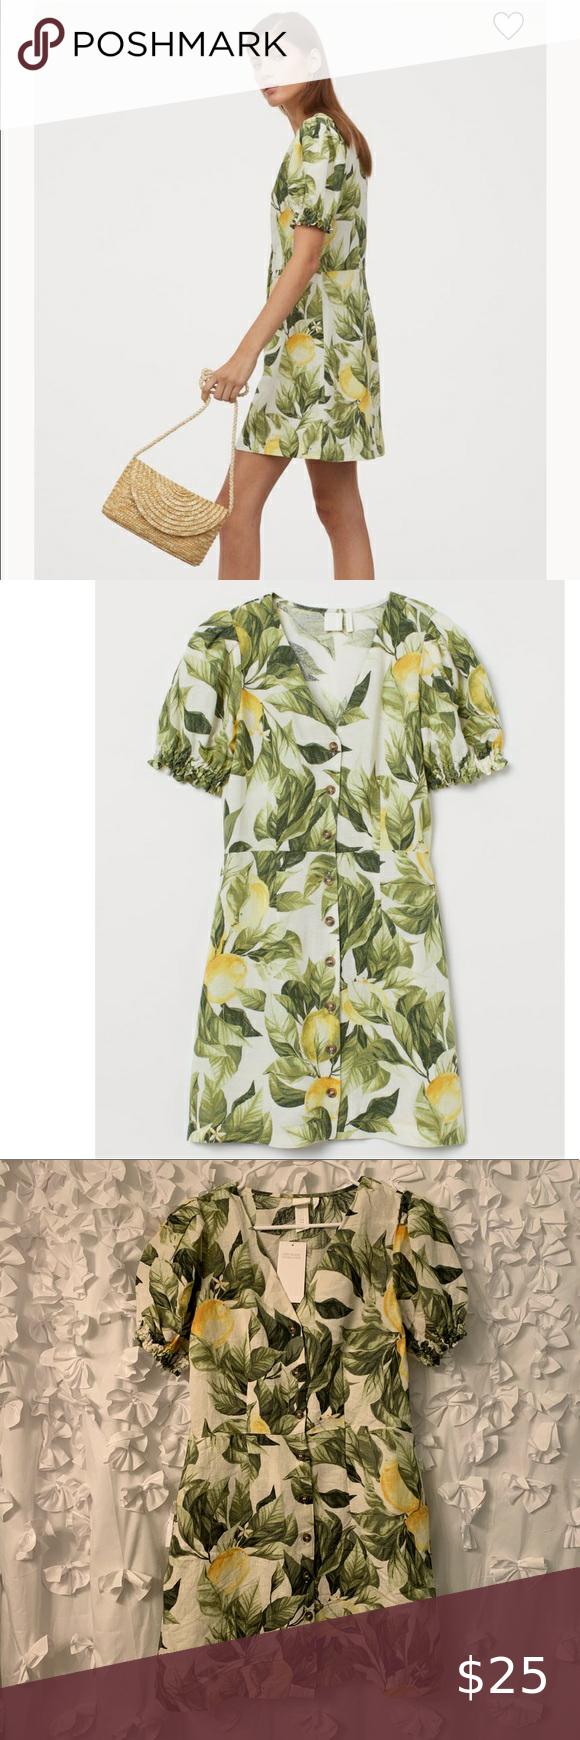 Nwt H M Puff Sleeved Dress In Lemon Print Puffed Sleeves Dress Dresses With Sleeves Puff Sleeve Dresses [ 1740 x 580 Pixel ]